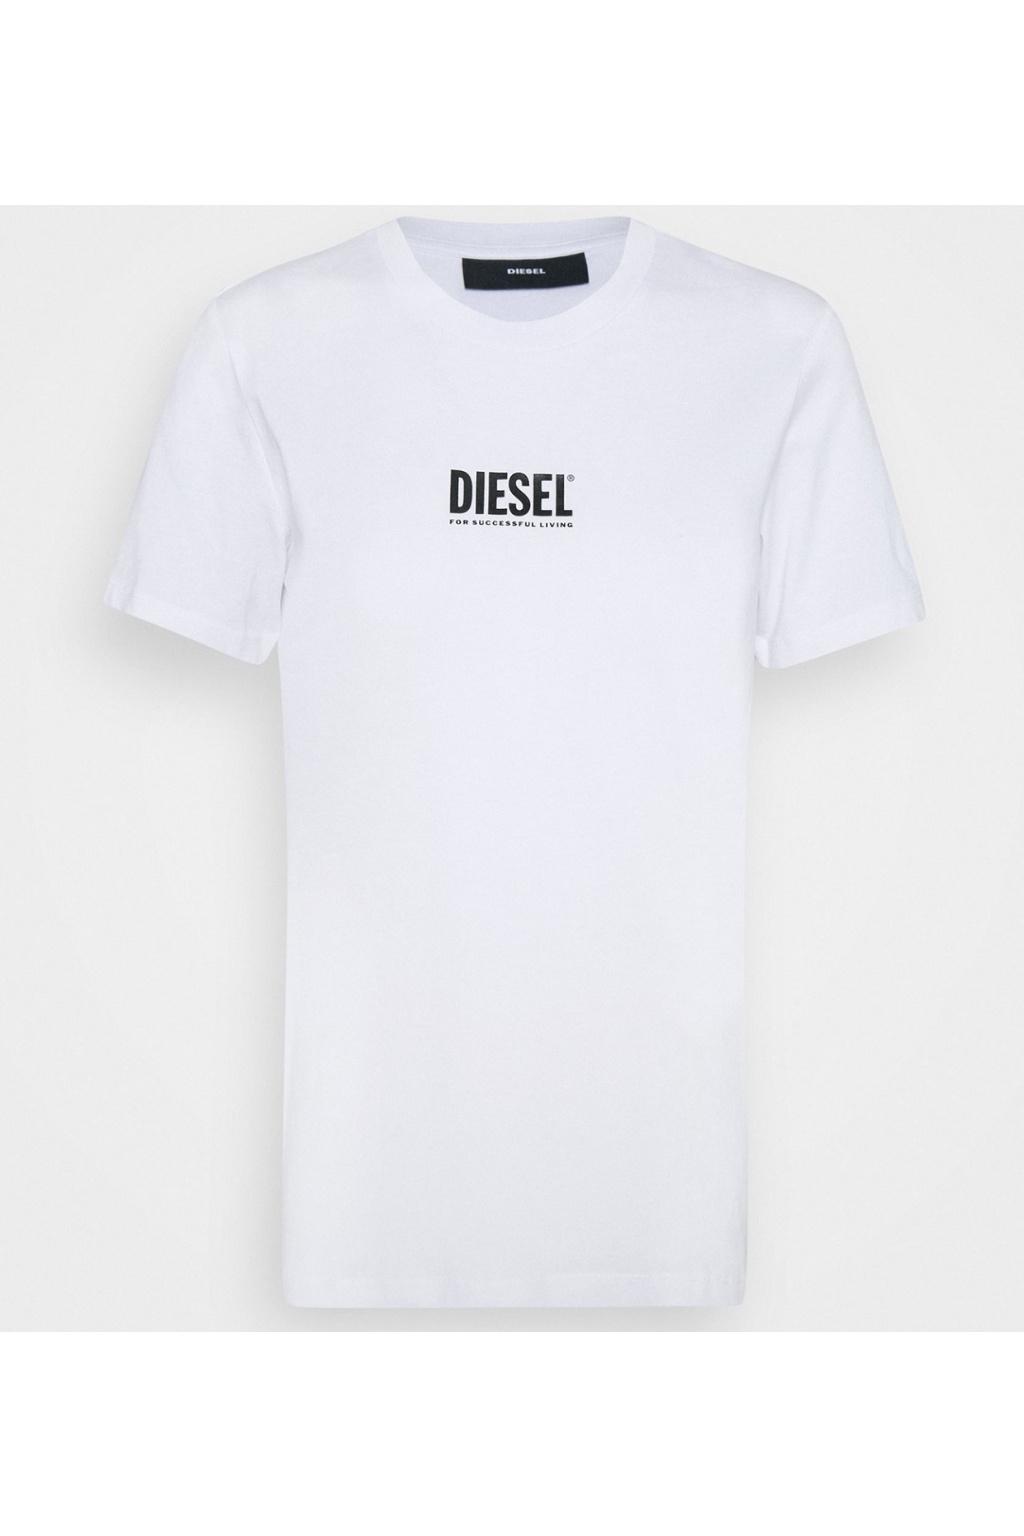 Dámské tričko Diesel T sily Ecosmallogo bílé